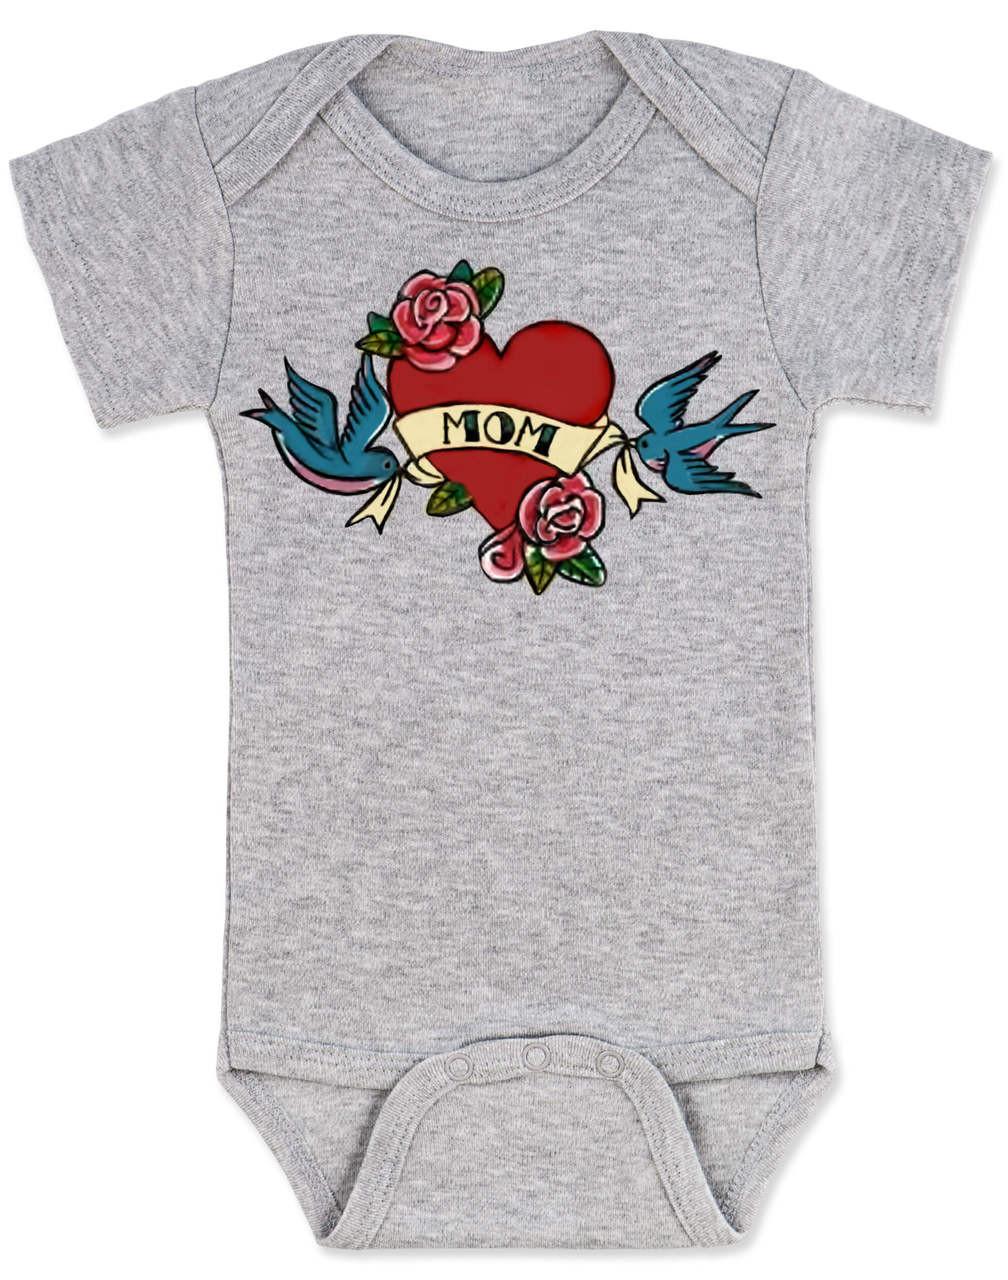 Future Metal Head  Rock Babygrow Vest Baby Clothing Funny Gift